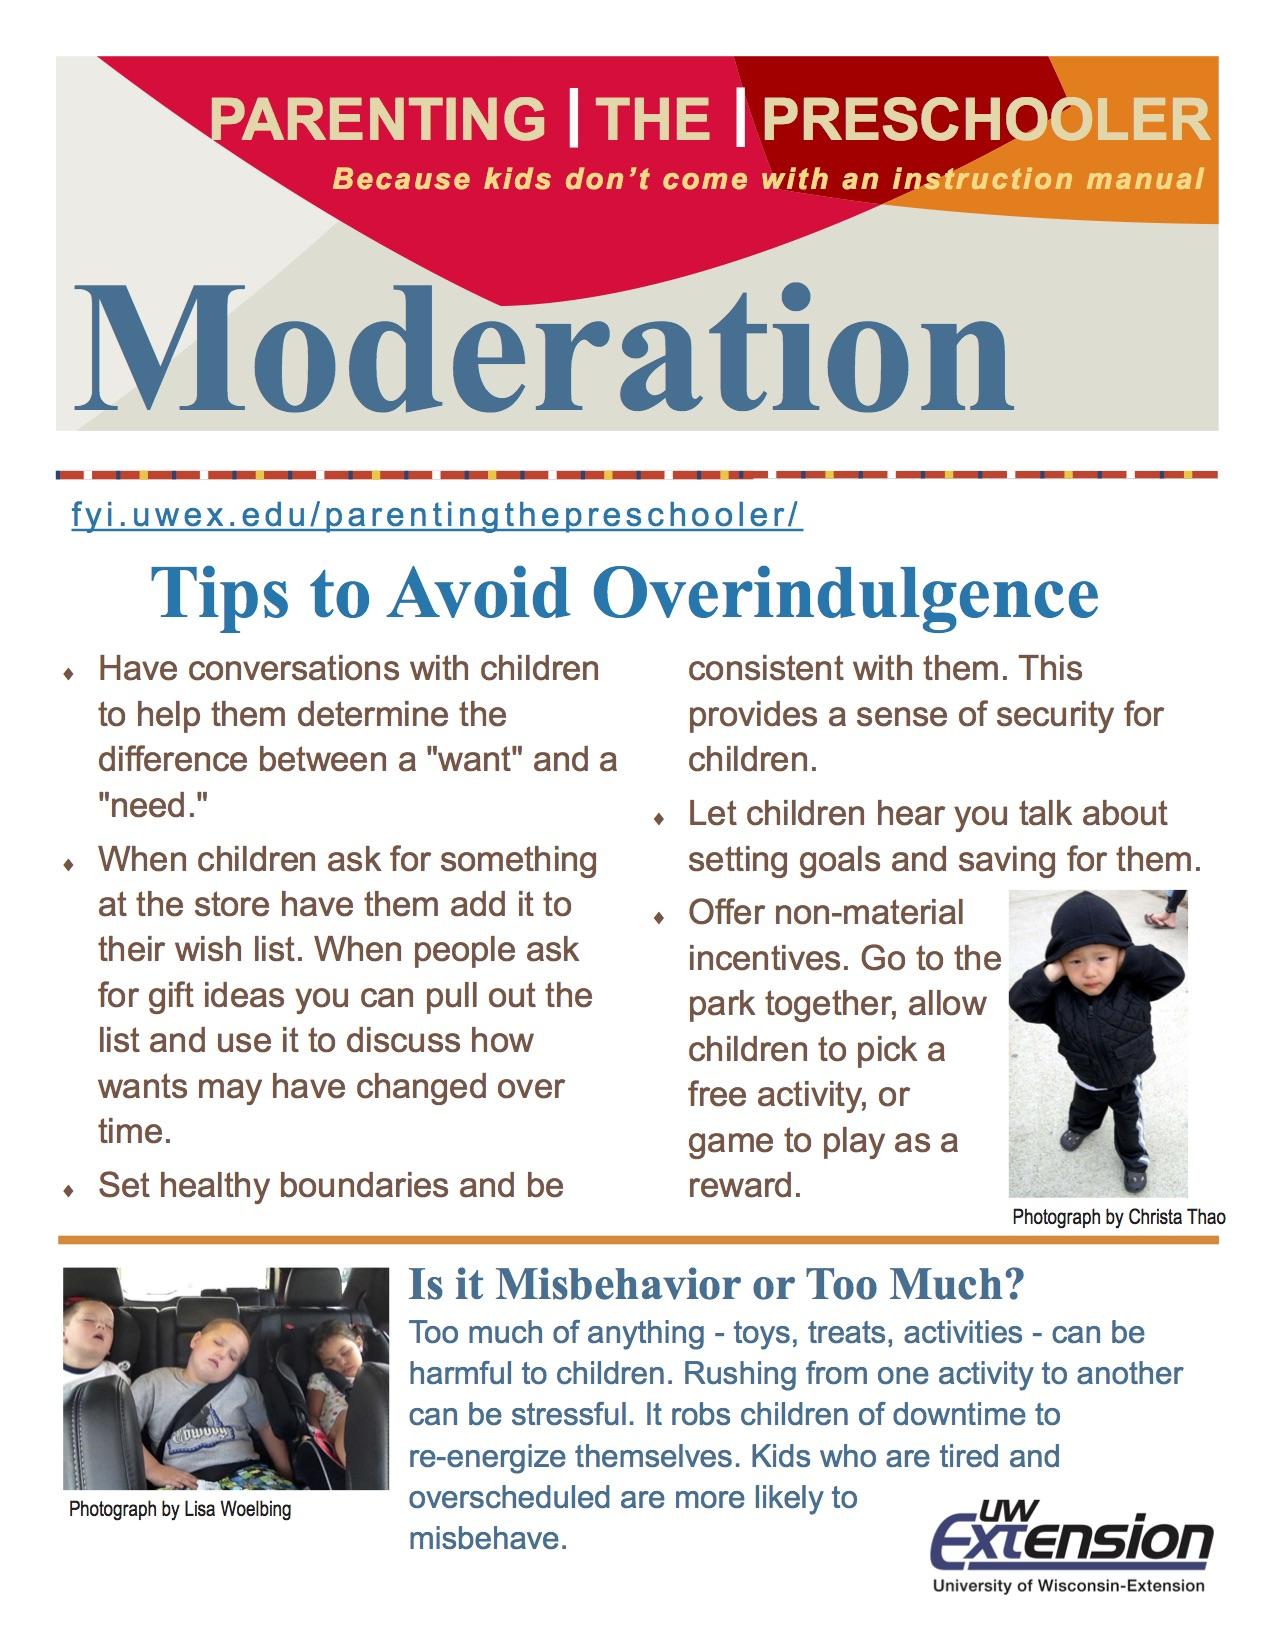 PtP-Moderation-State